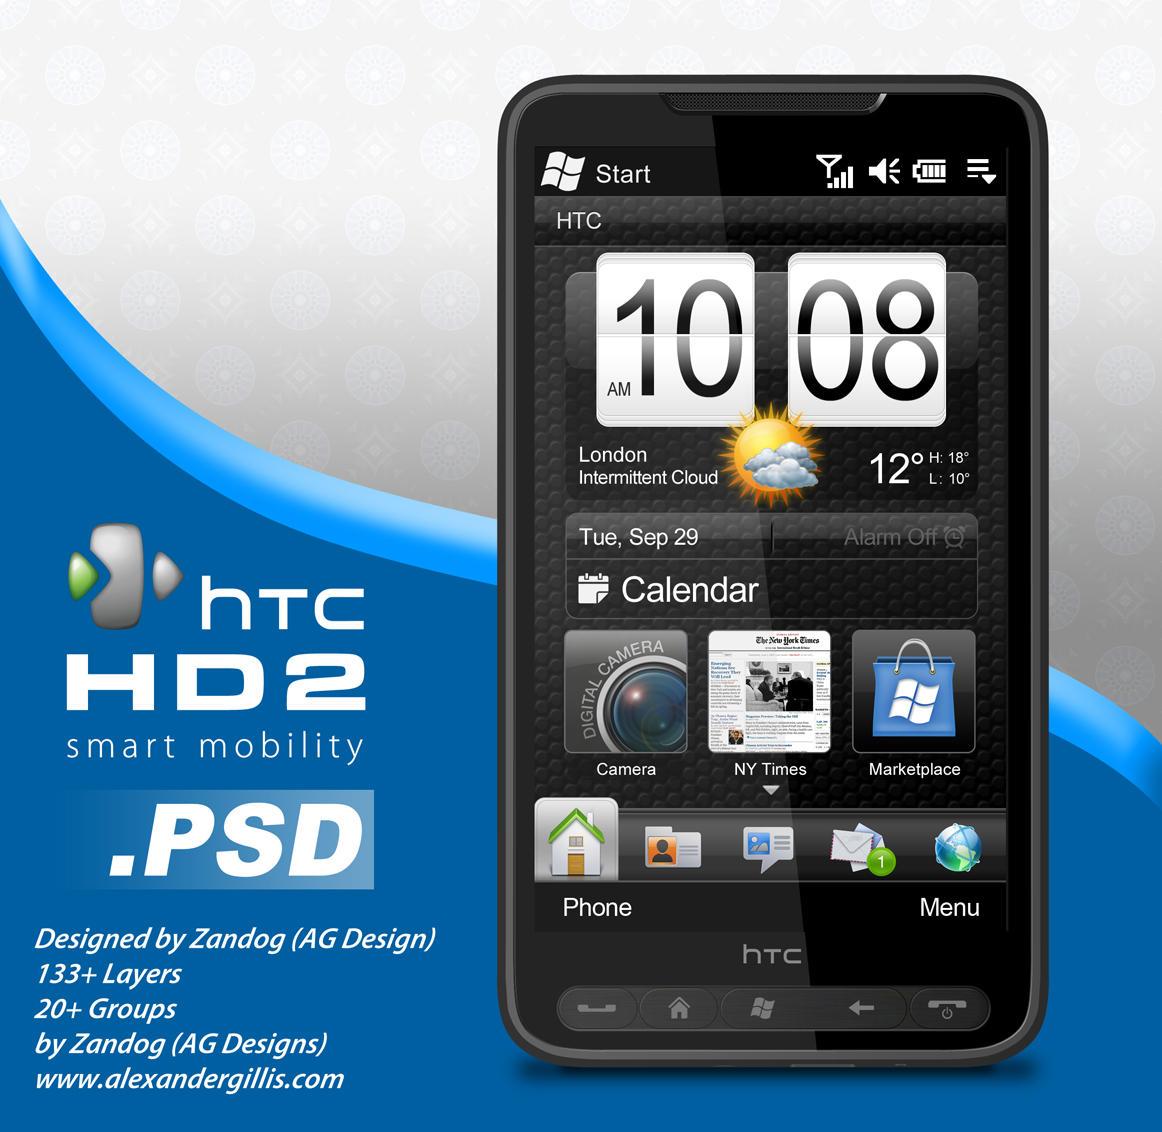 HTC HD2 Smartphone .PSD by zandog